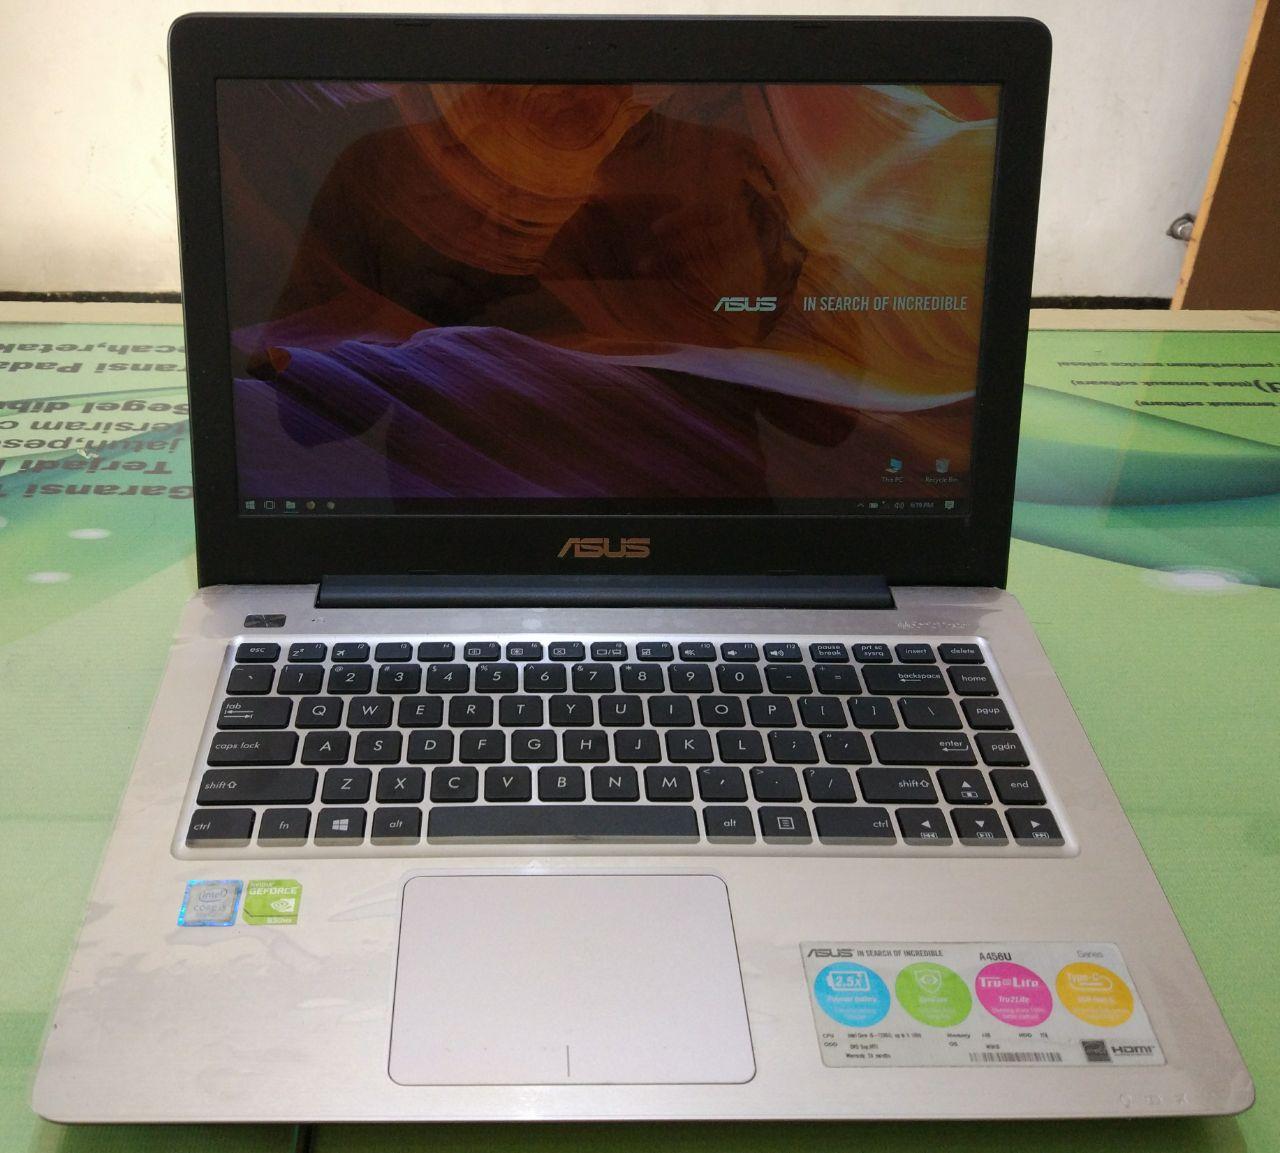 Asus Notebook A456ur Core I5 7200 4gb 1tb Gt 930mx 2gb 147 Daftar Wx037d Dark Blue 14 Inch 6200u 4 Gb 1 Tb Dos Ga092t Kabylake Geforce Gt930mx Fullset Laptop Bekas